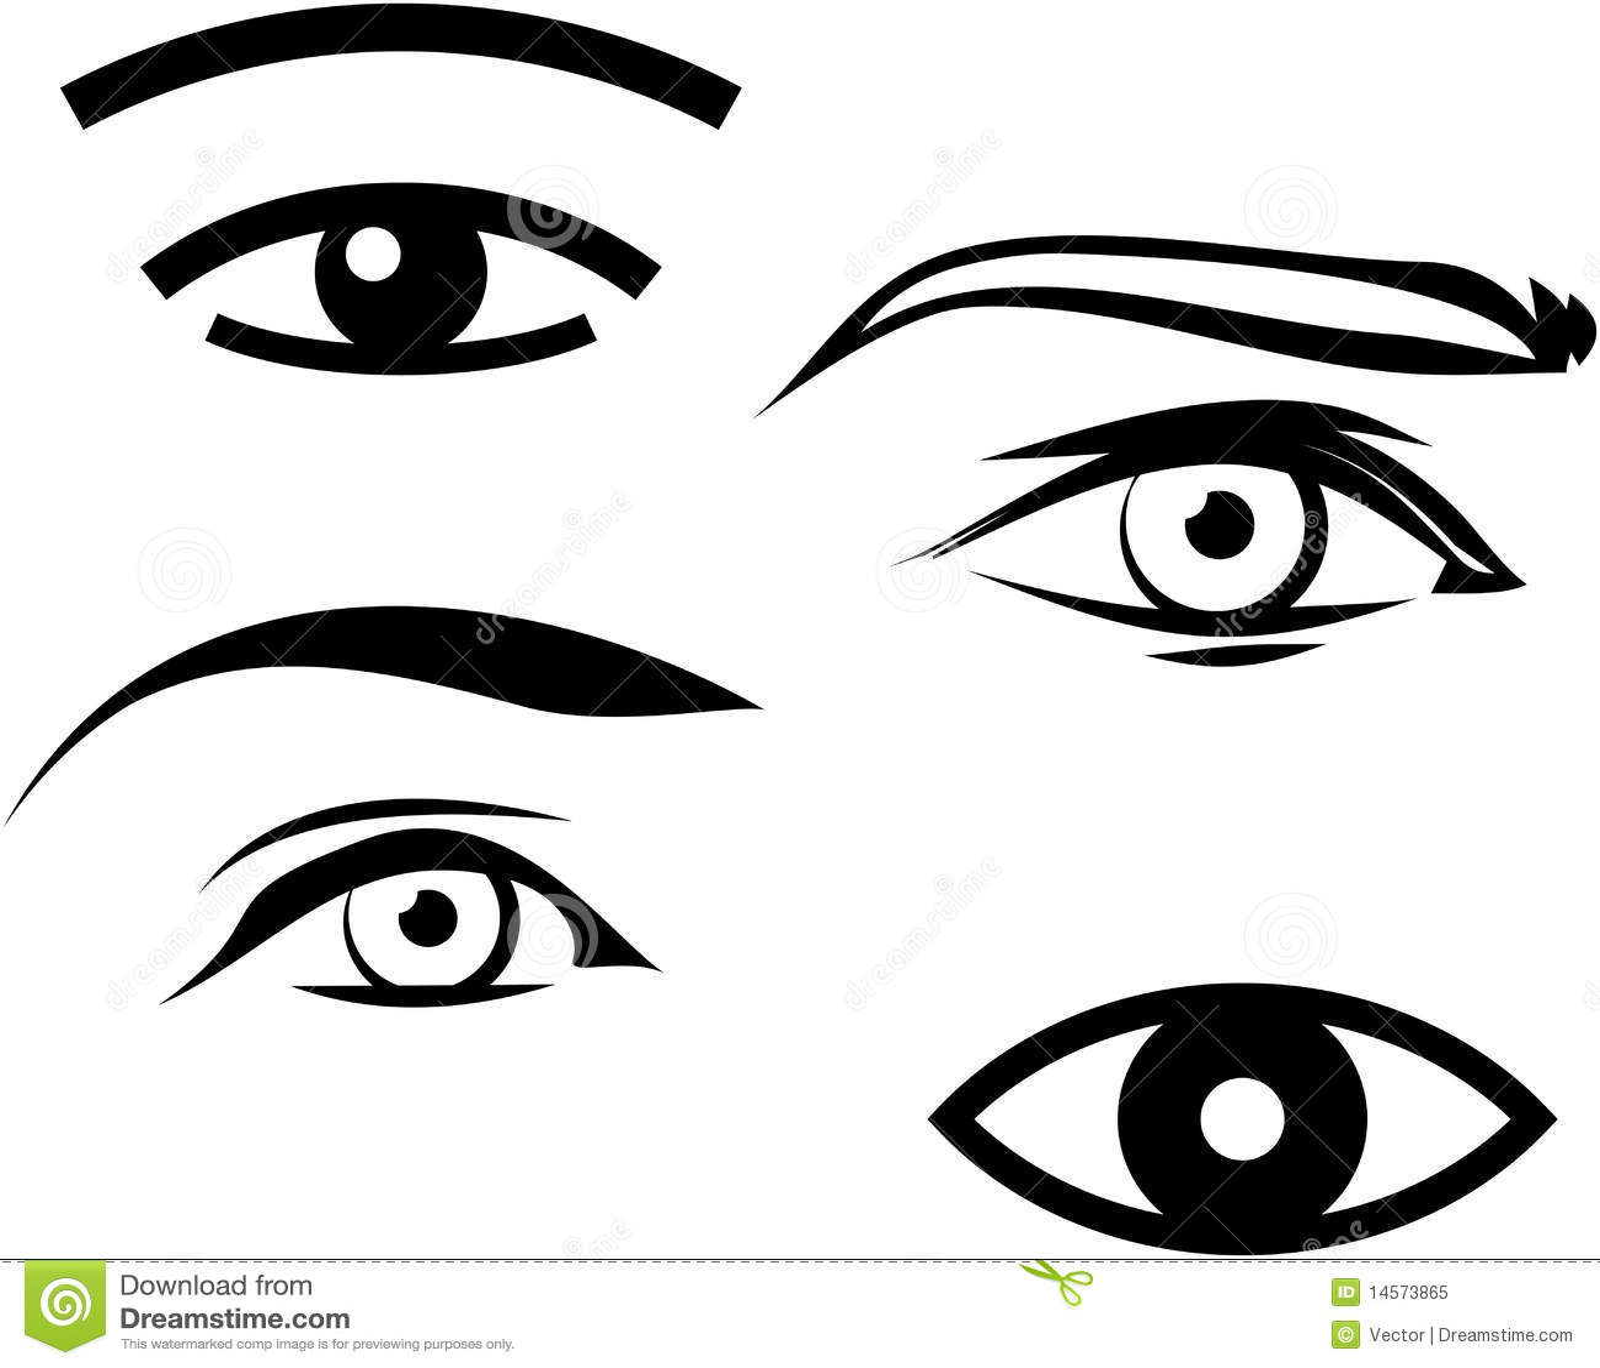 human male and female eyes illustration stock vector illustration rh dreamstime com vector eyeball vector eye silhouette